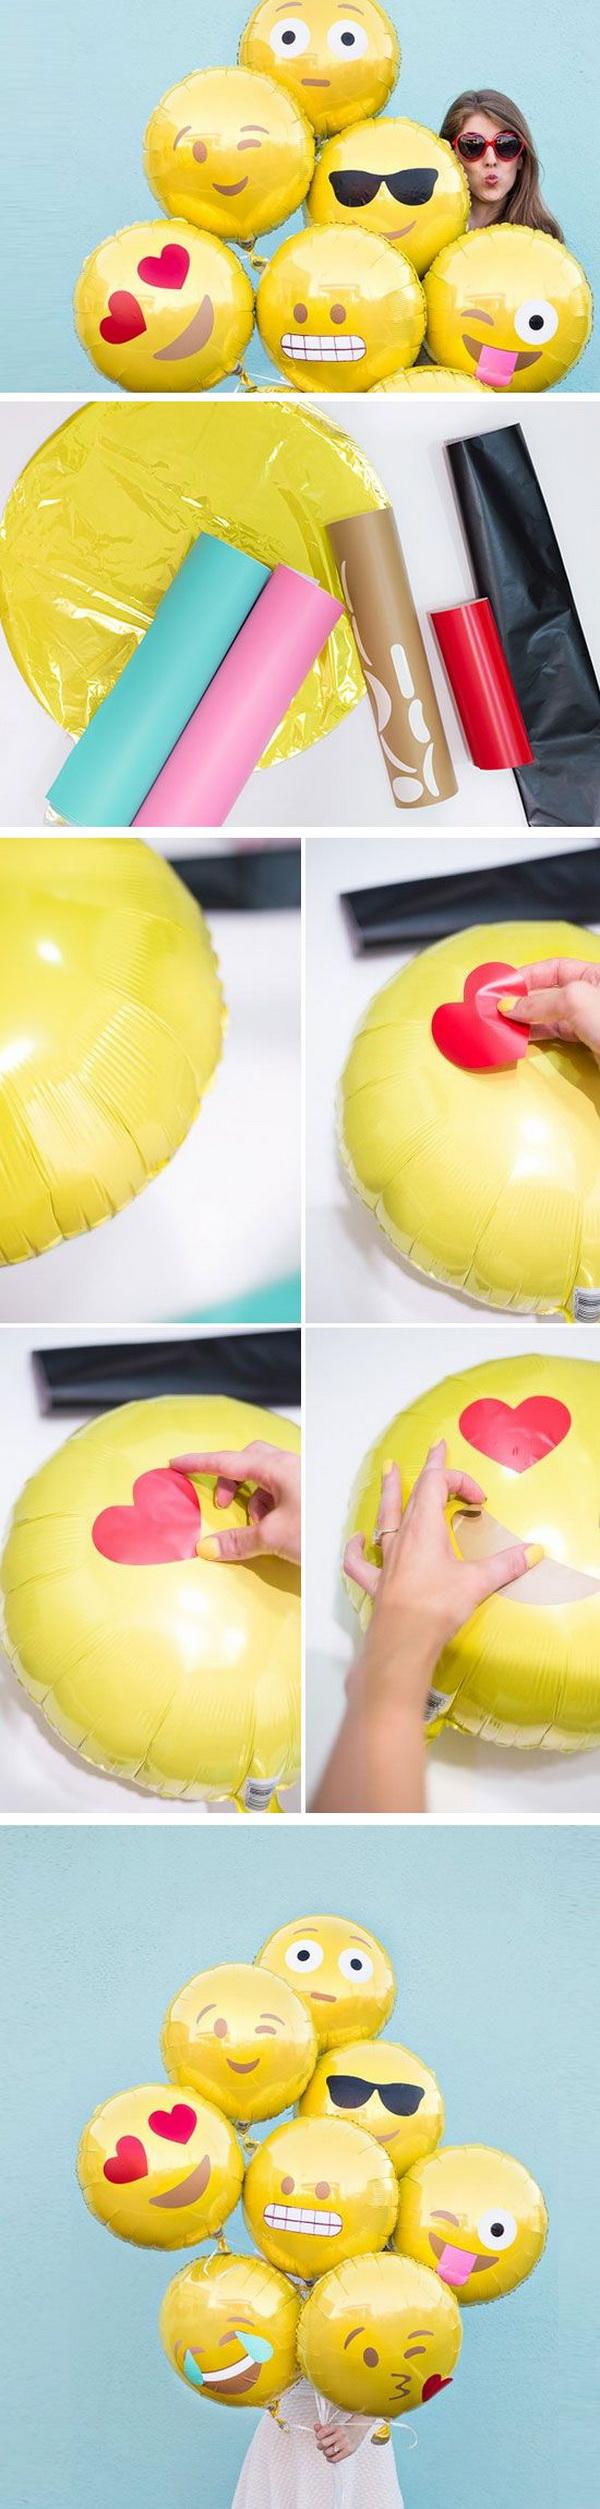 DIY Emoji Balloons  sc 1 st  For Creative Juice & 50+ Pretty Balloon Decoration Ideas - For Creative Juice